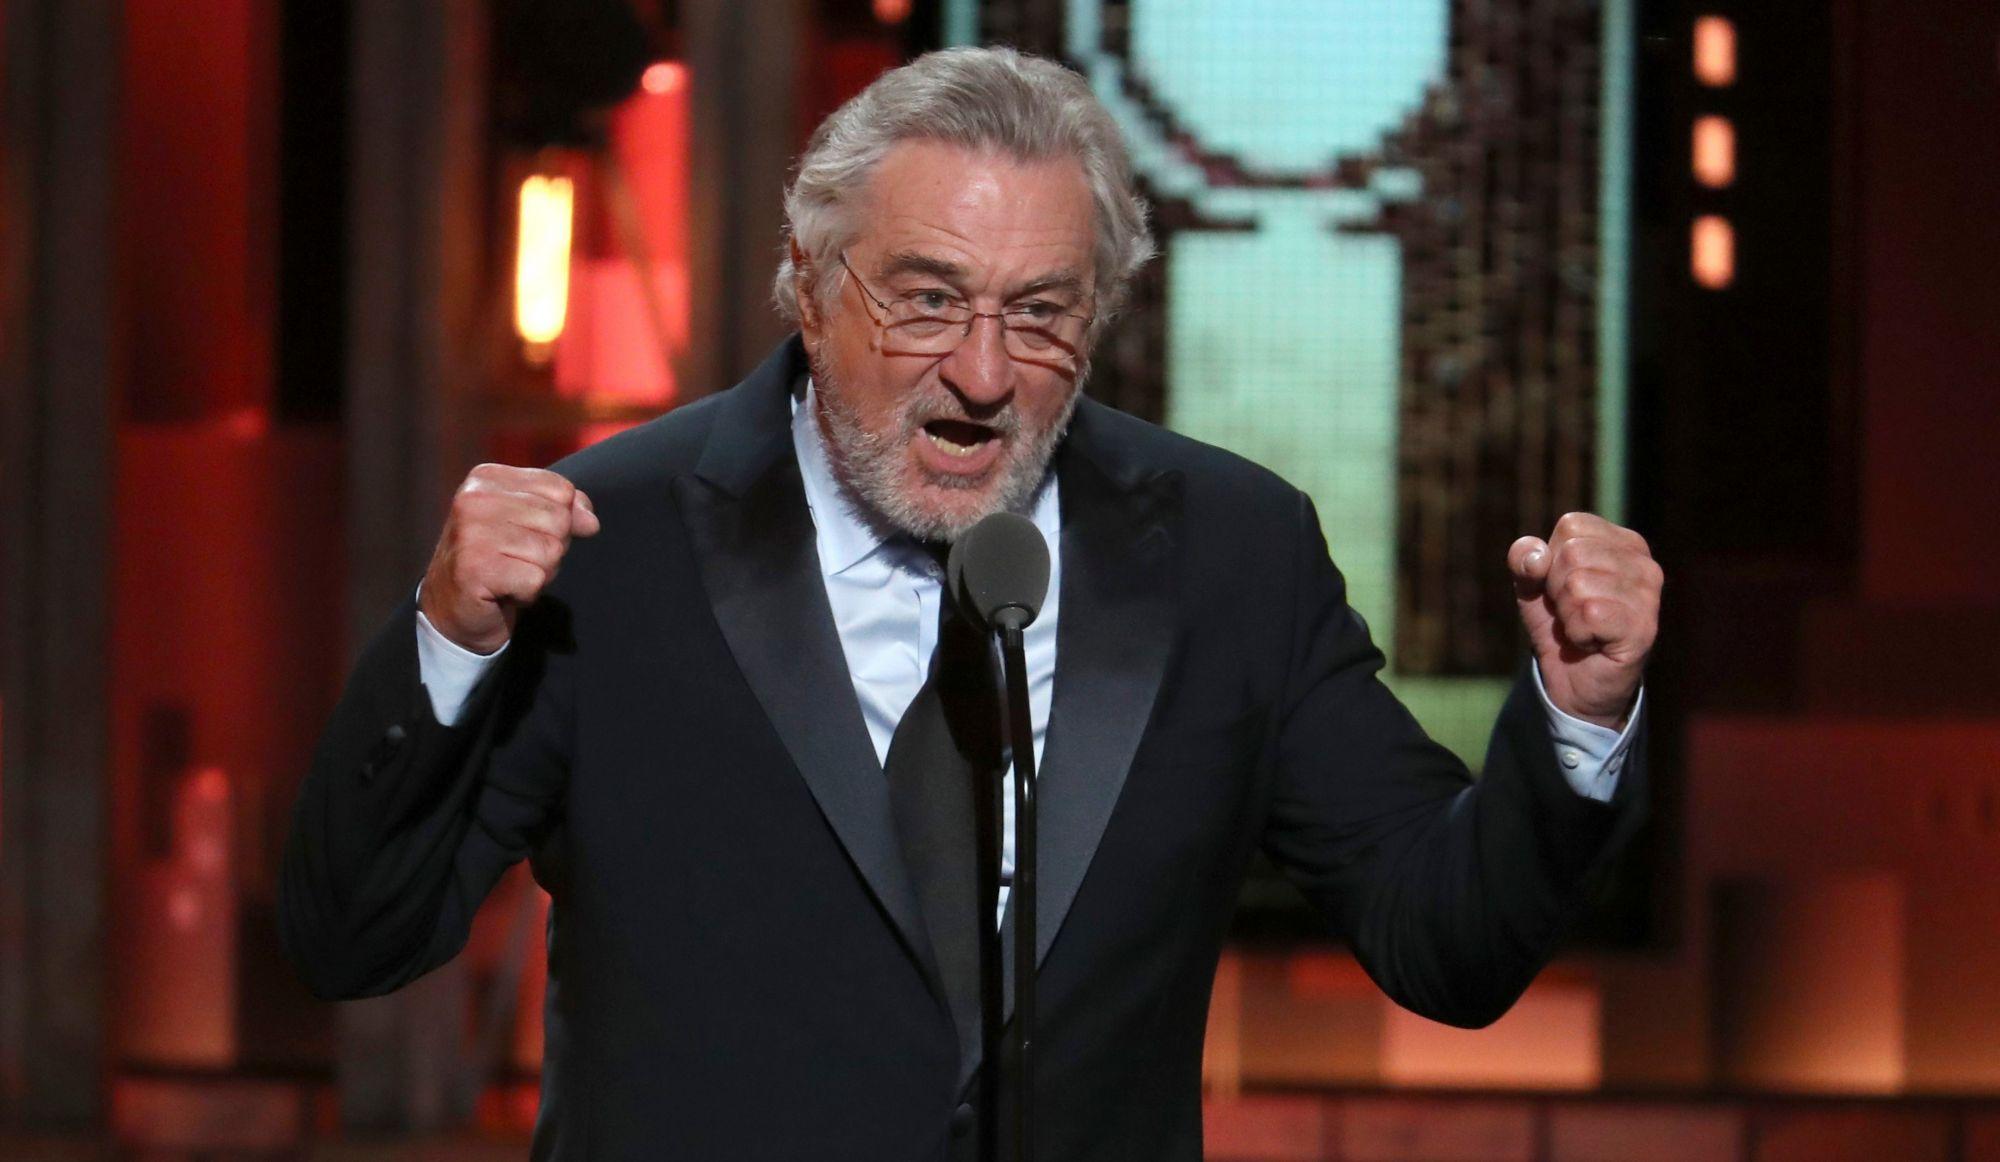 Tony Awards: Robert De Niro insulte Trump et reçoit une ovation debout